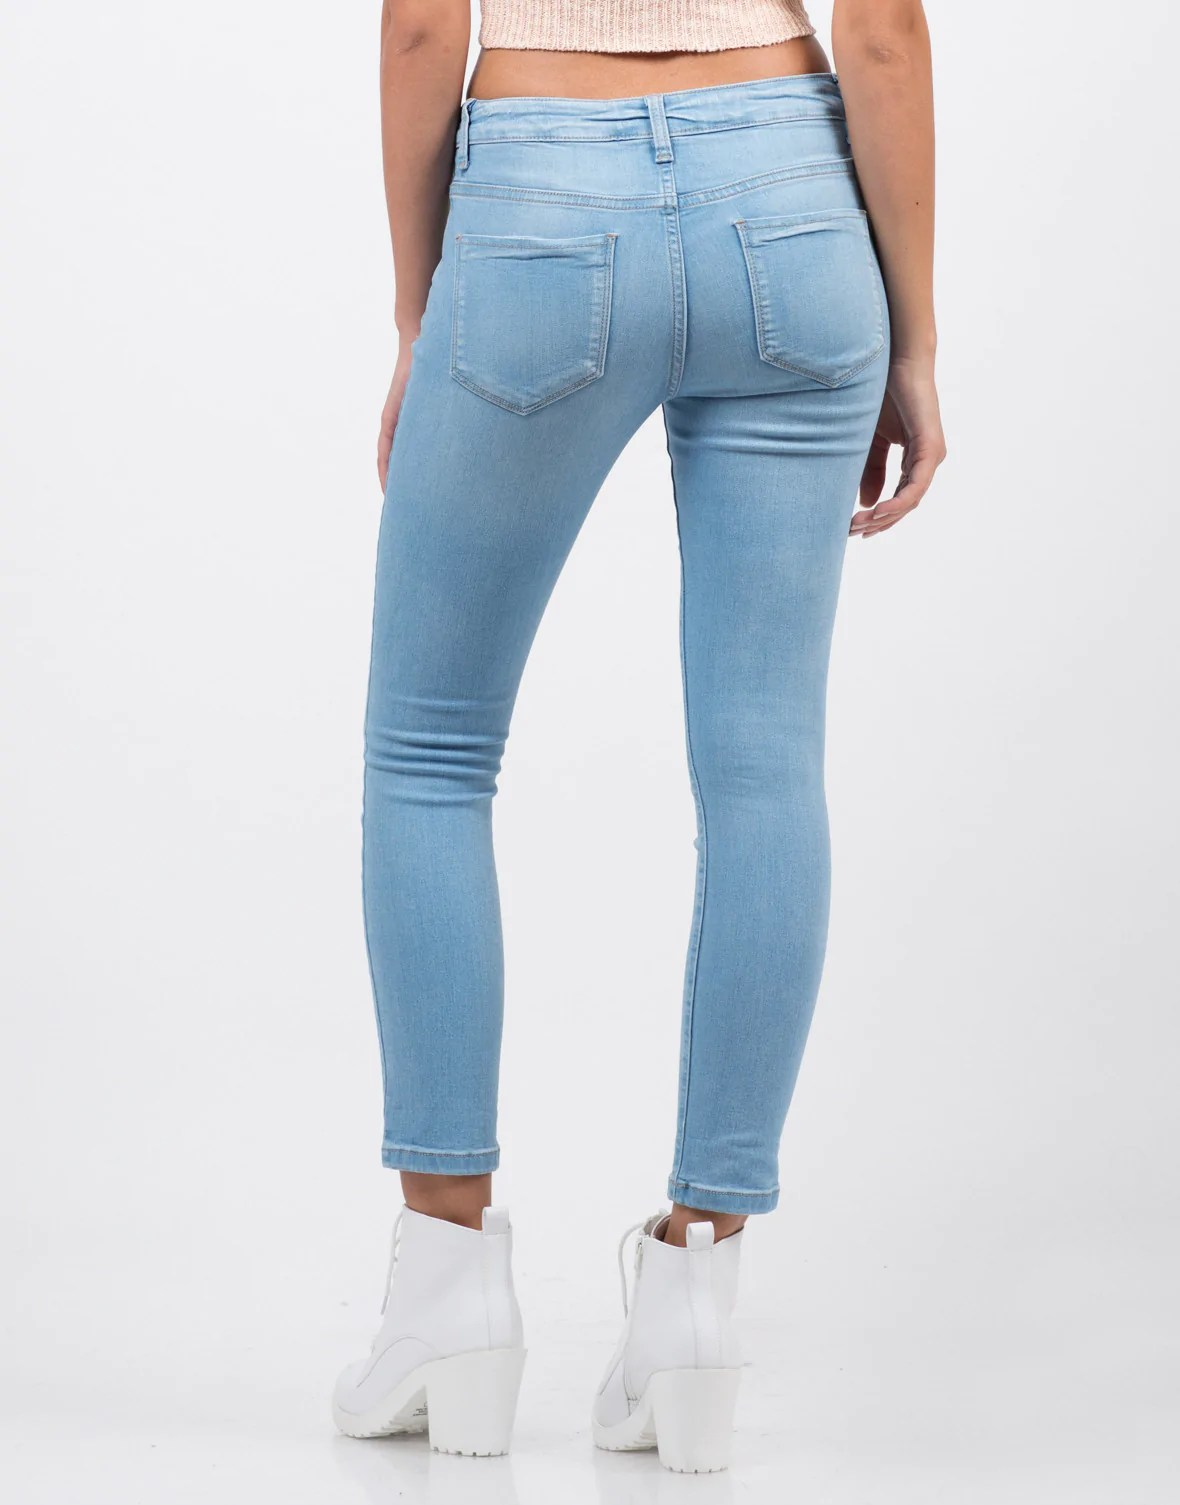 Classic Crop Skinny Jeans  Blue Jeans  Light Blue Denim